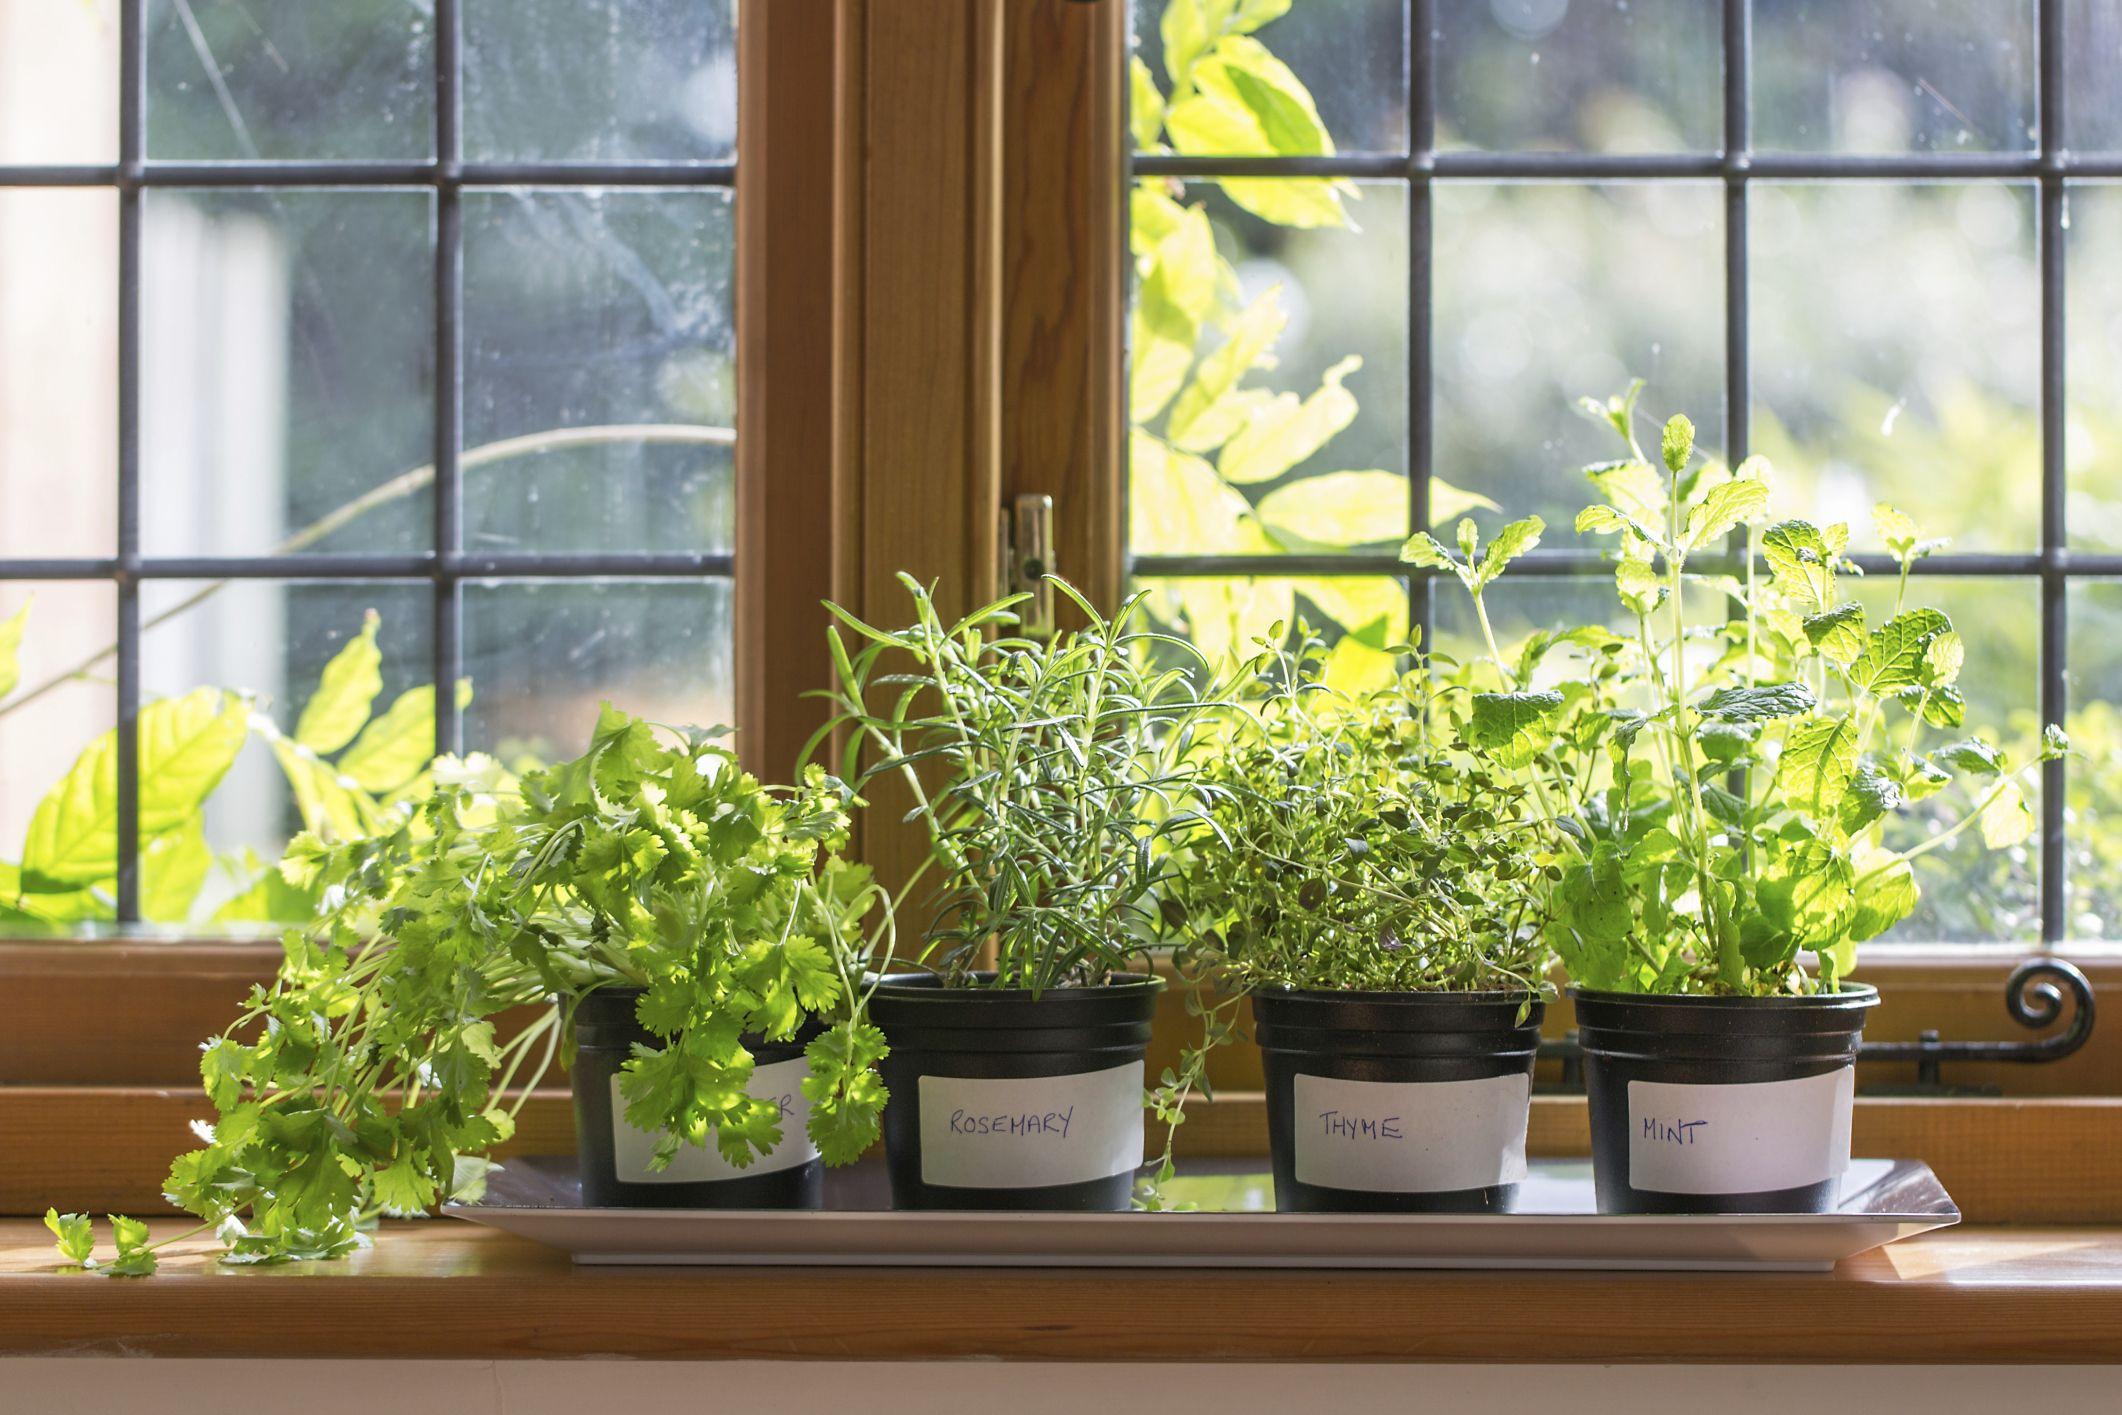 Indoor Herbs Bring Life Fragrance To Kitchen Windows In Winter